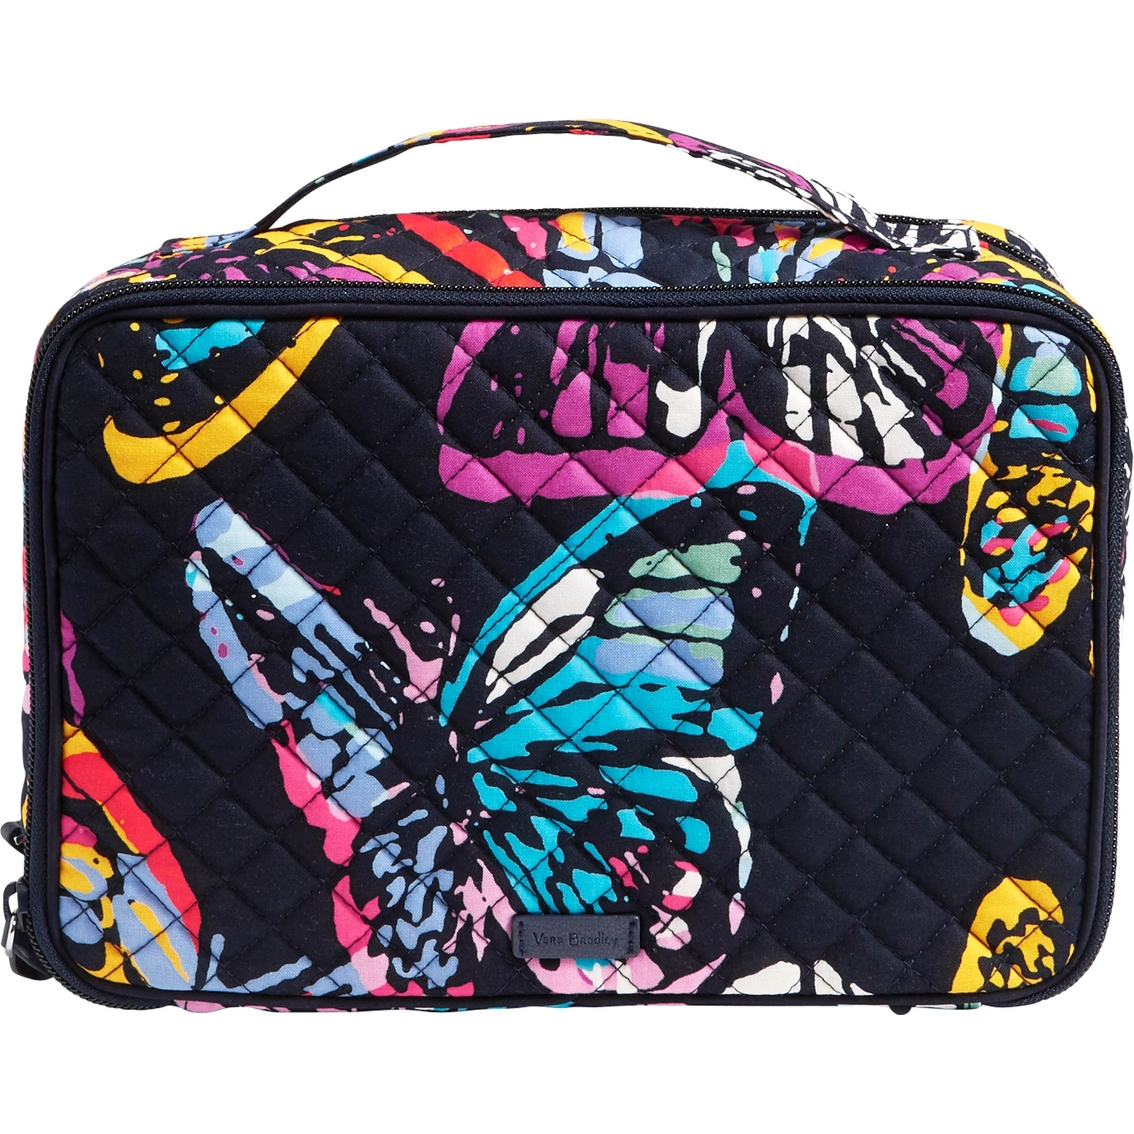 Vera Bradley Iconic Large Blush & Brush Case, Butterfly Flutter ...